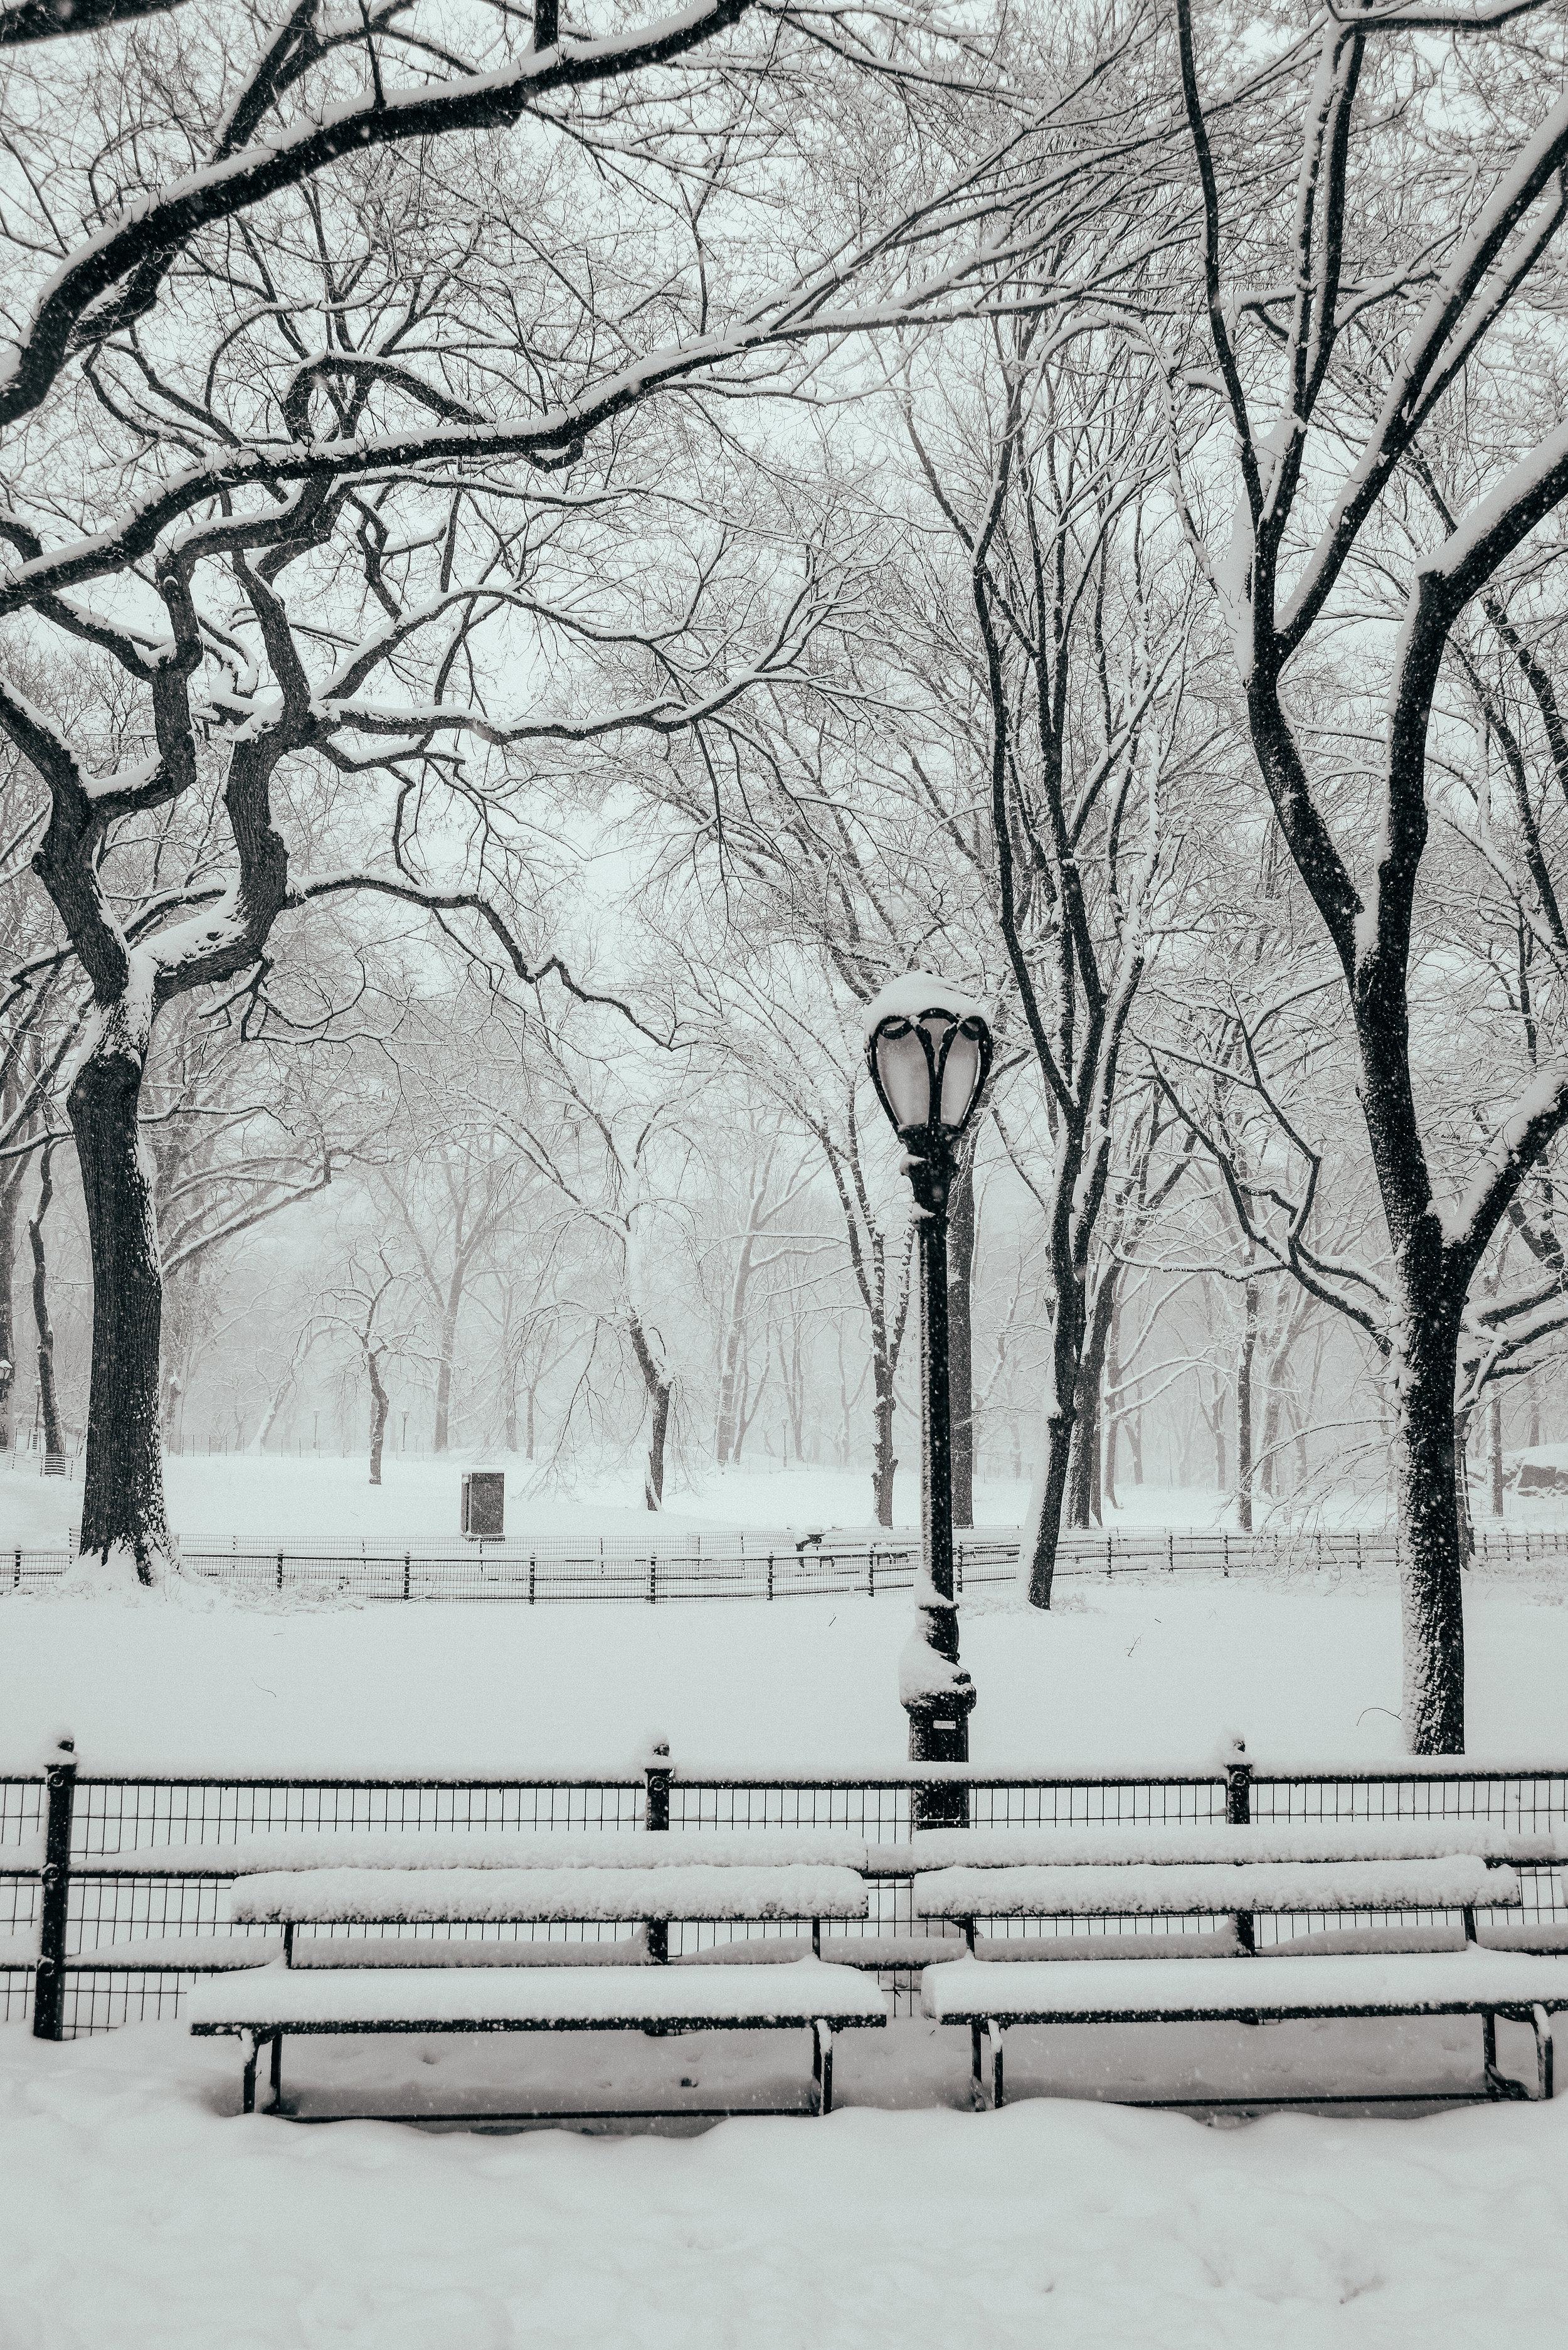 Winter_Storm-11.jpg